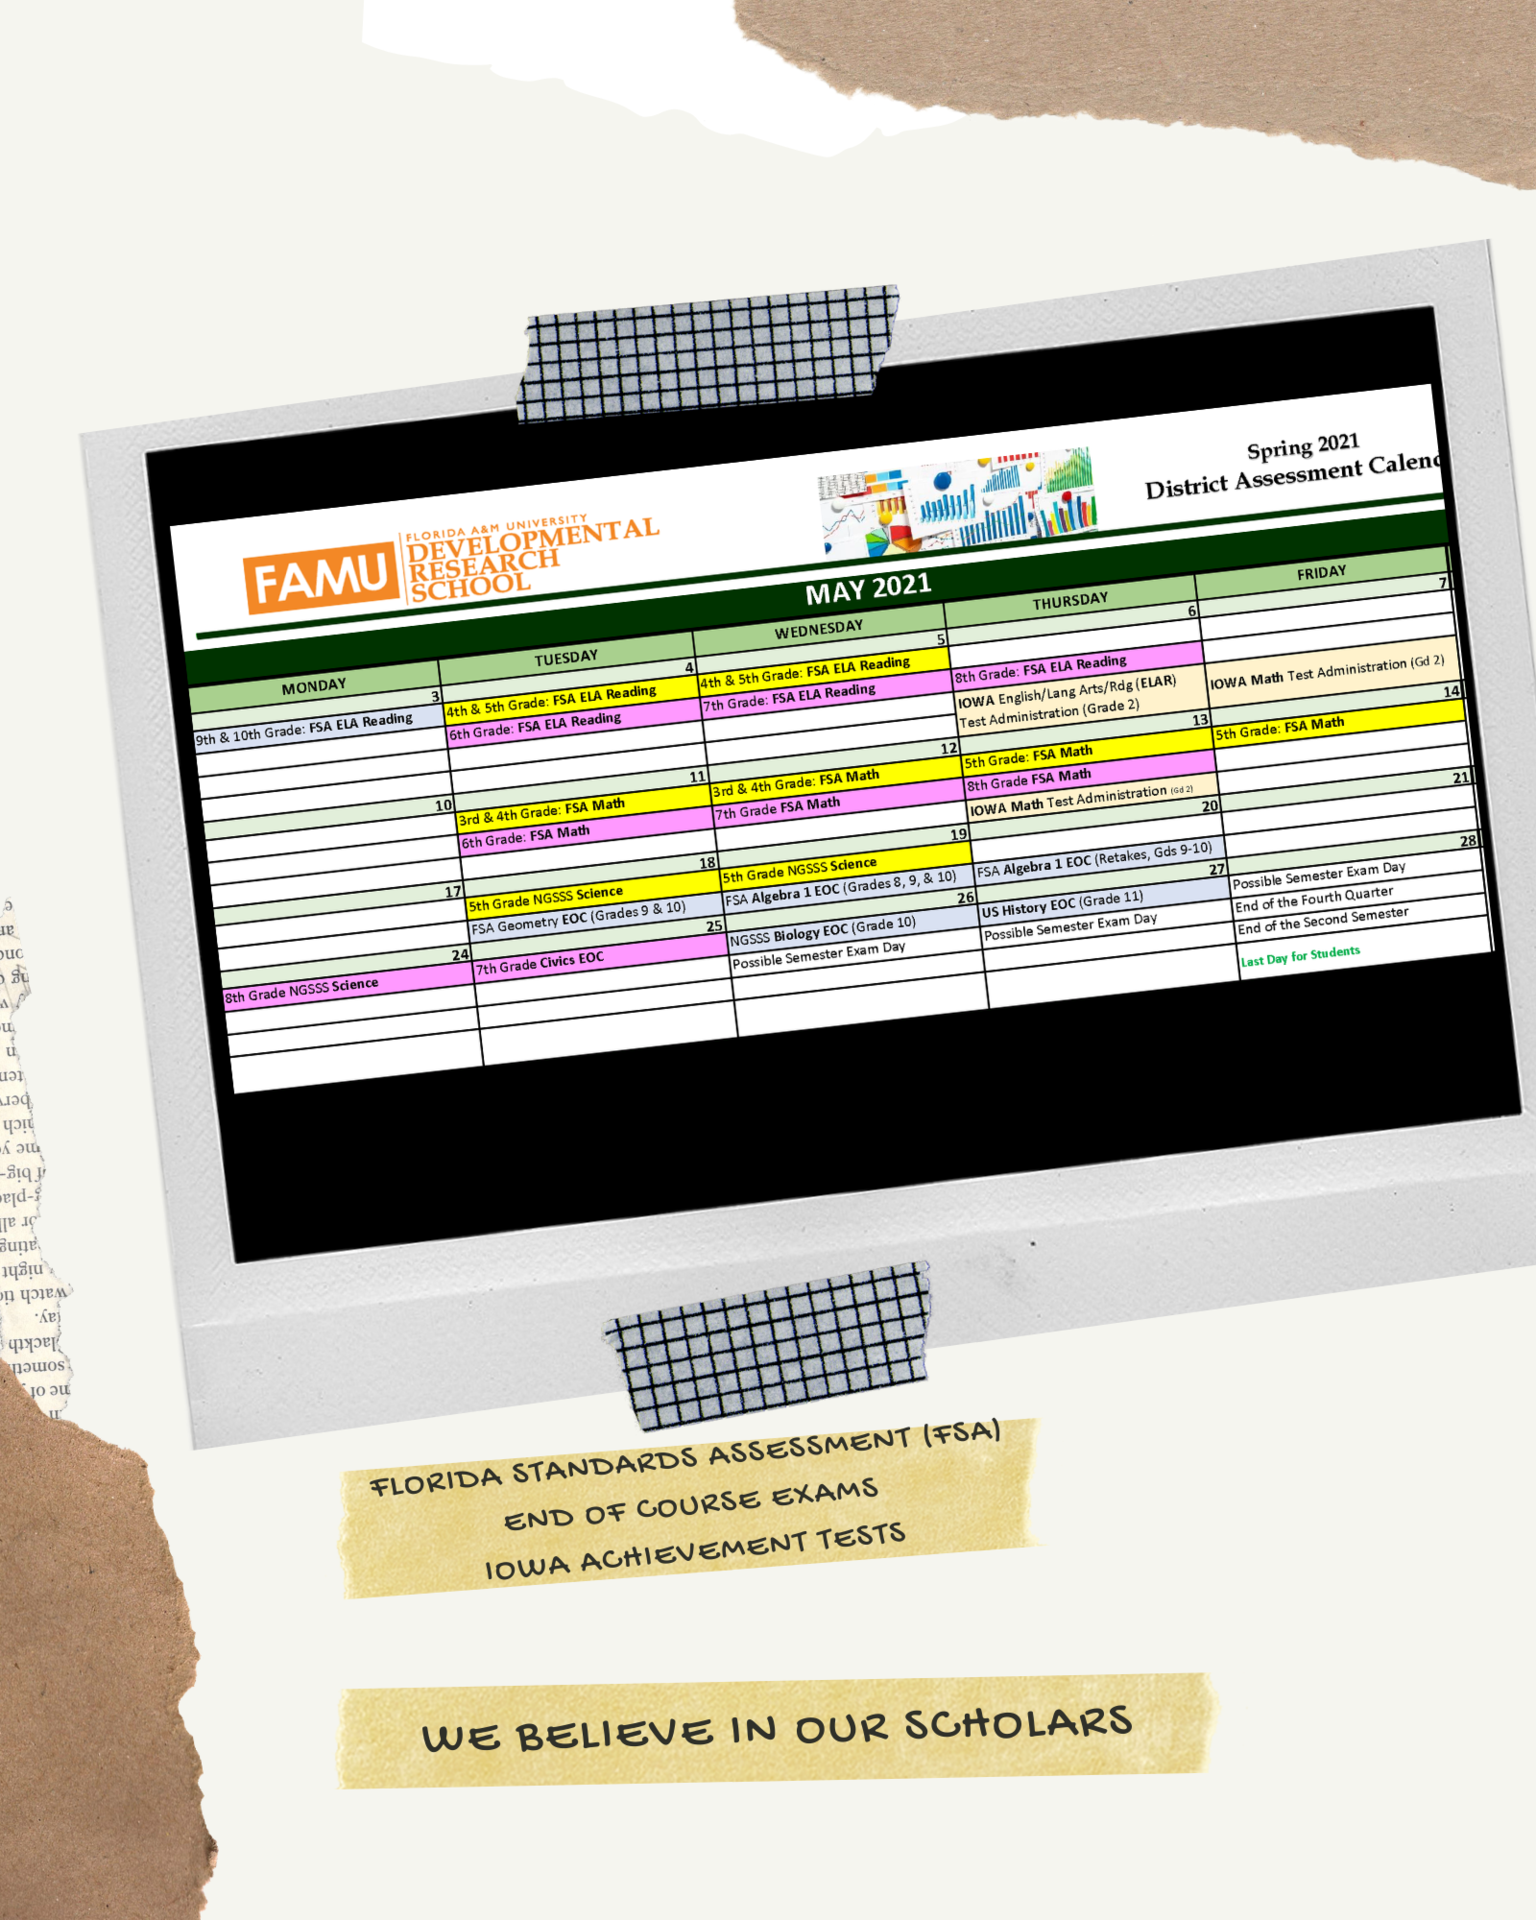 May 2021 District Assessment Calendar